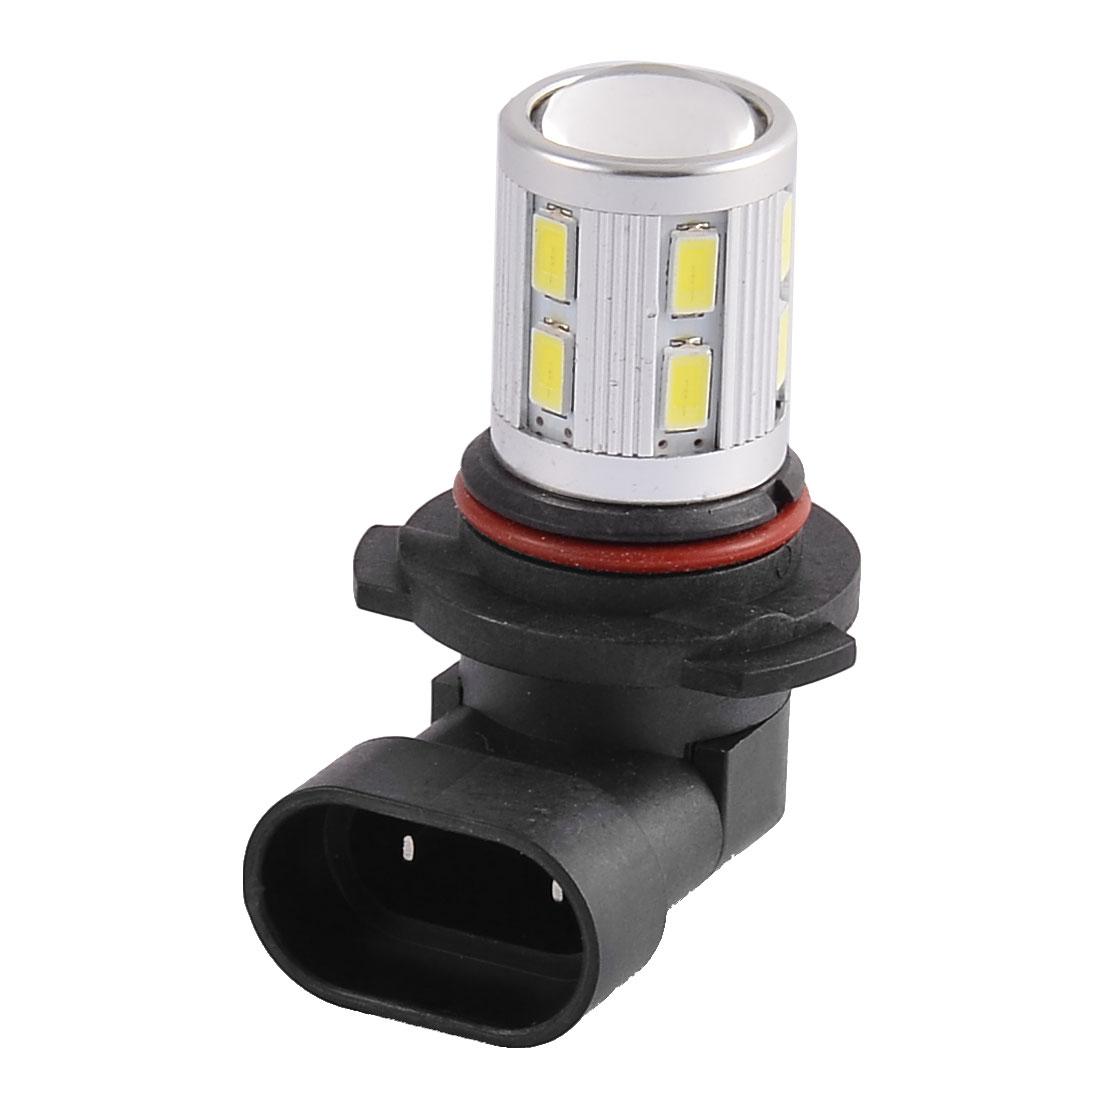 9006 HB4 5630 SMD 12 LED Lens Car Strob Flash DRL Fog Light Headlamp White Internal